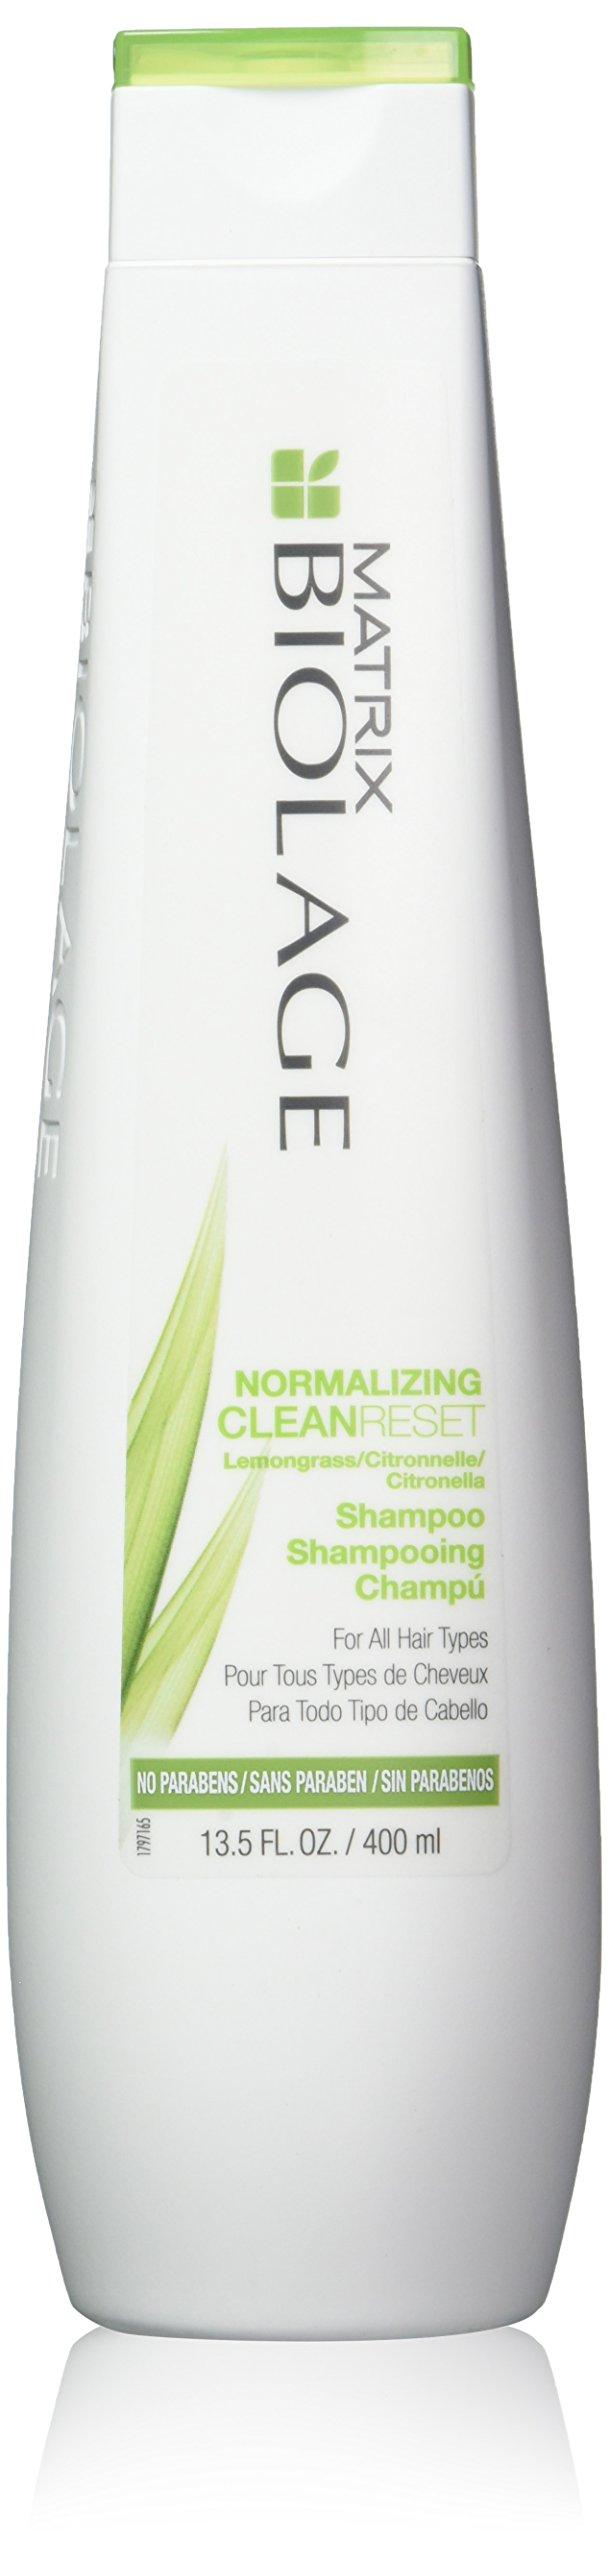 Matrix Biolage Normal Clean Reset Shampoo, 13.5 Fluid Ounce